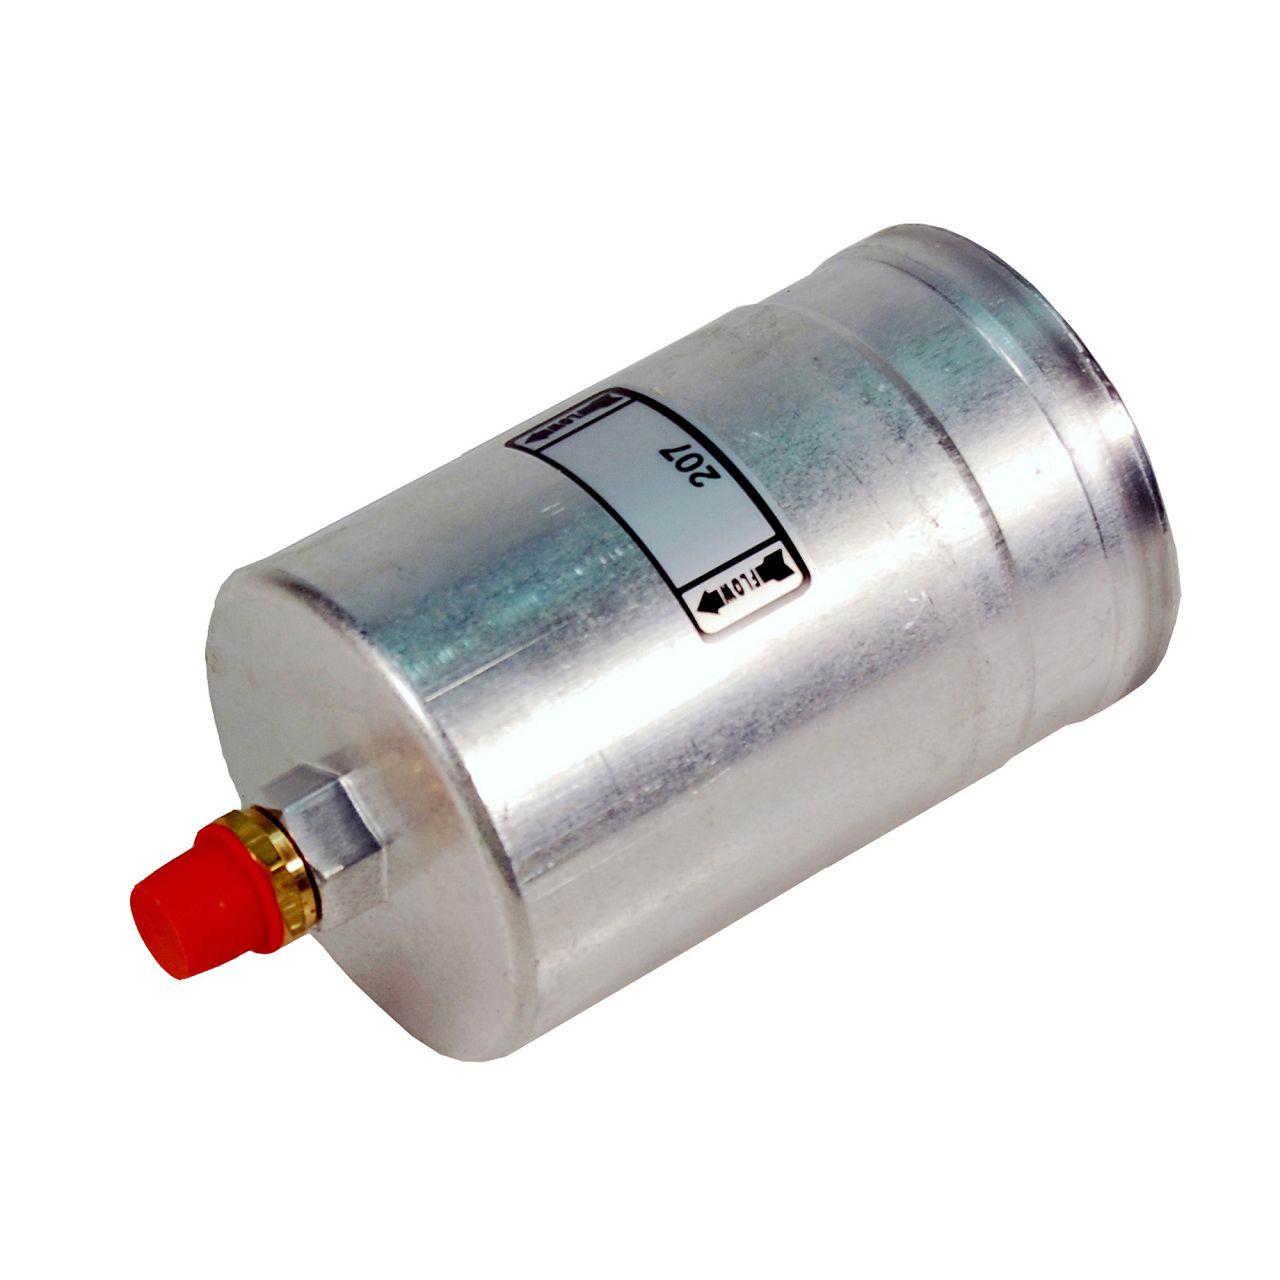 FILTRON Kraftstofffilter Benzinfilter PP835 MERCEDES-BENZ W201 W202 W124 W126